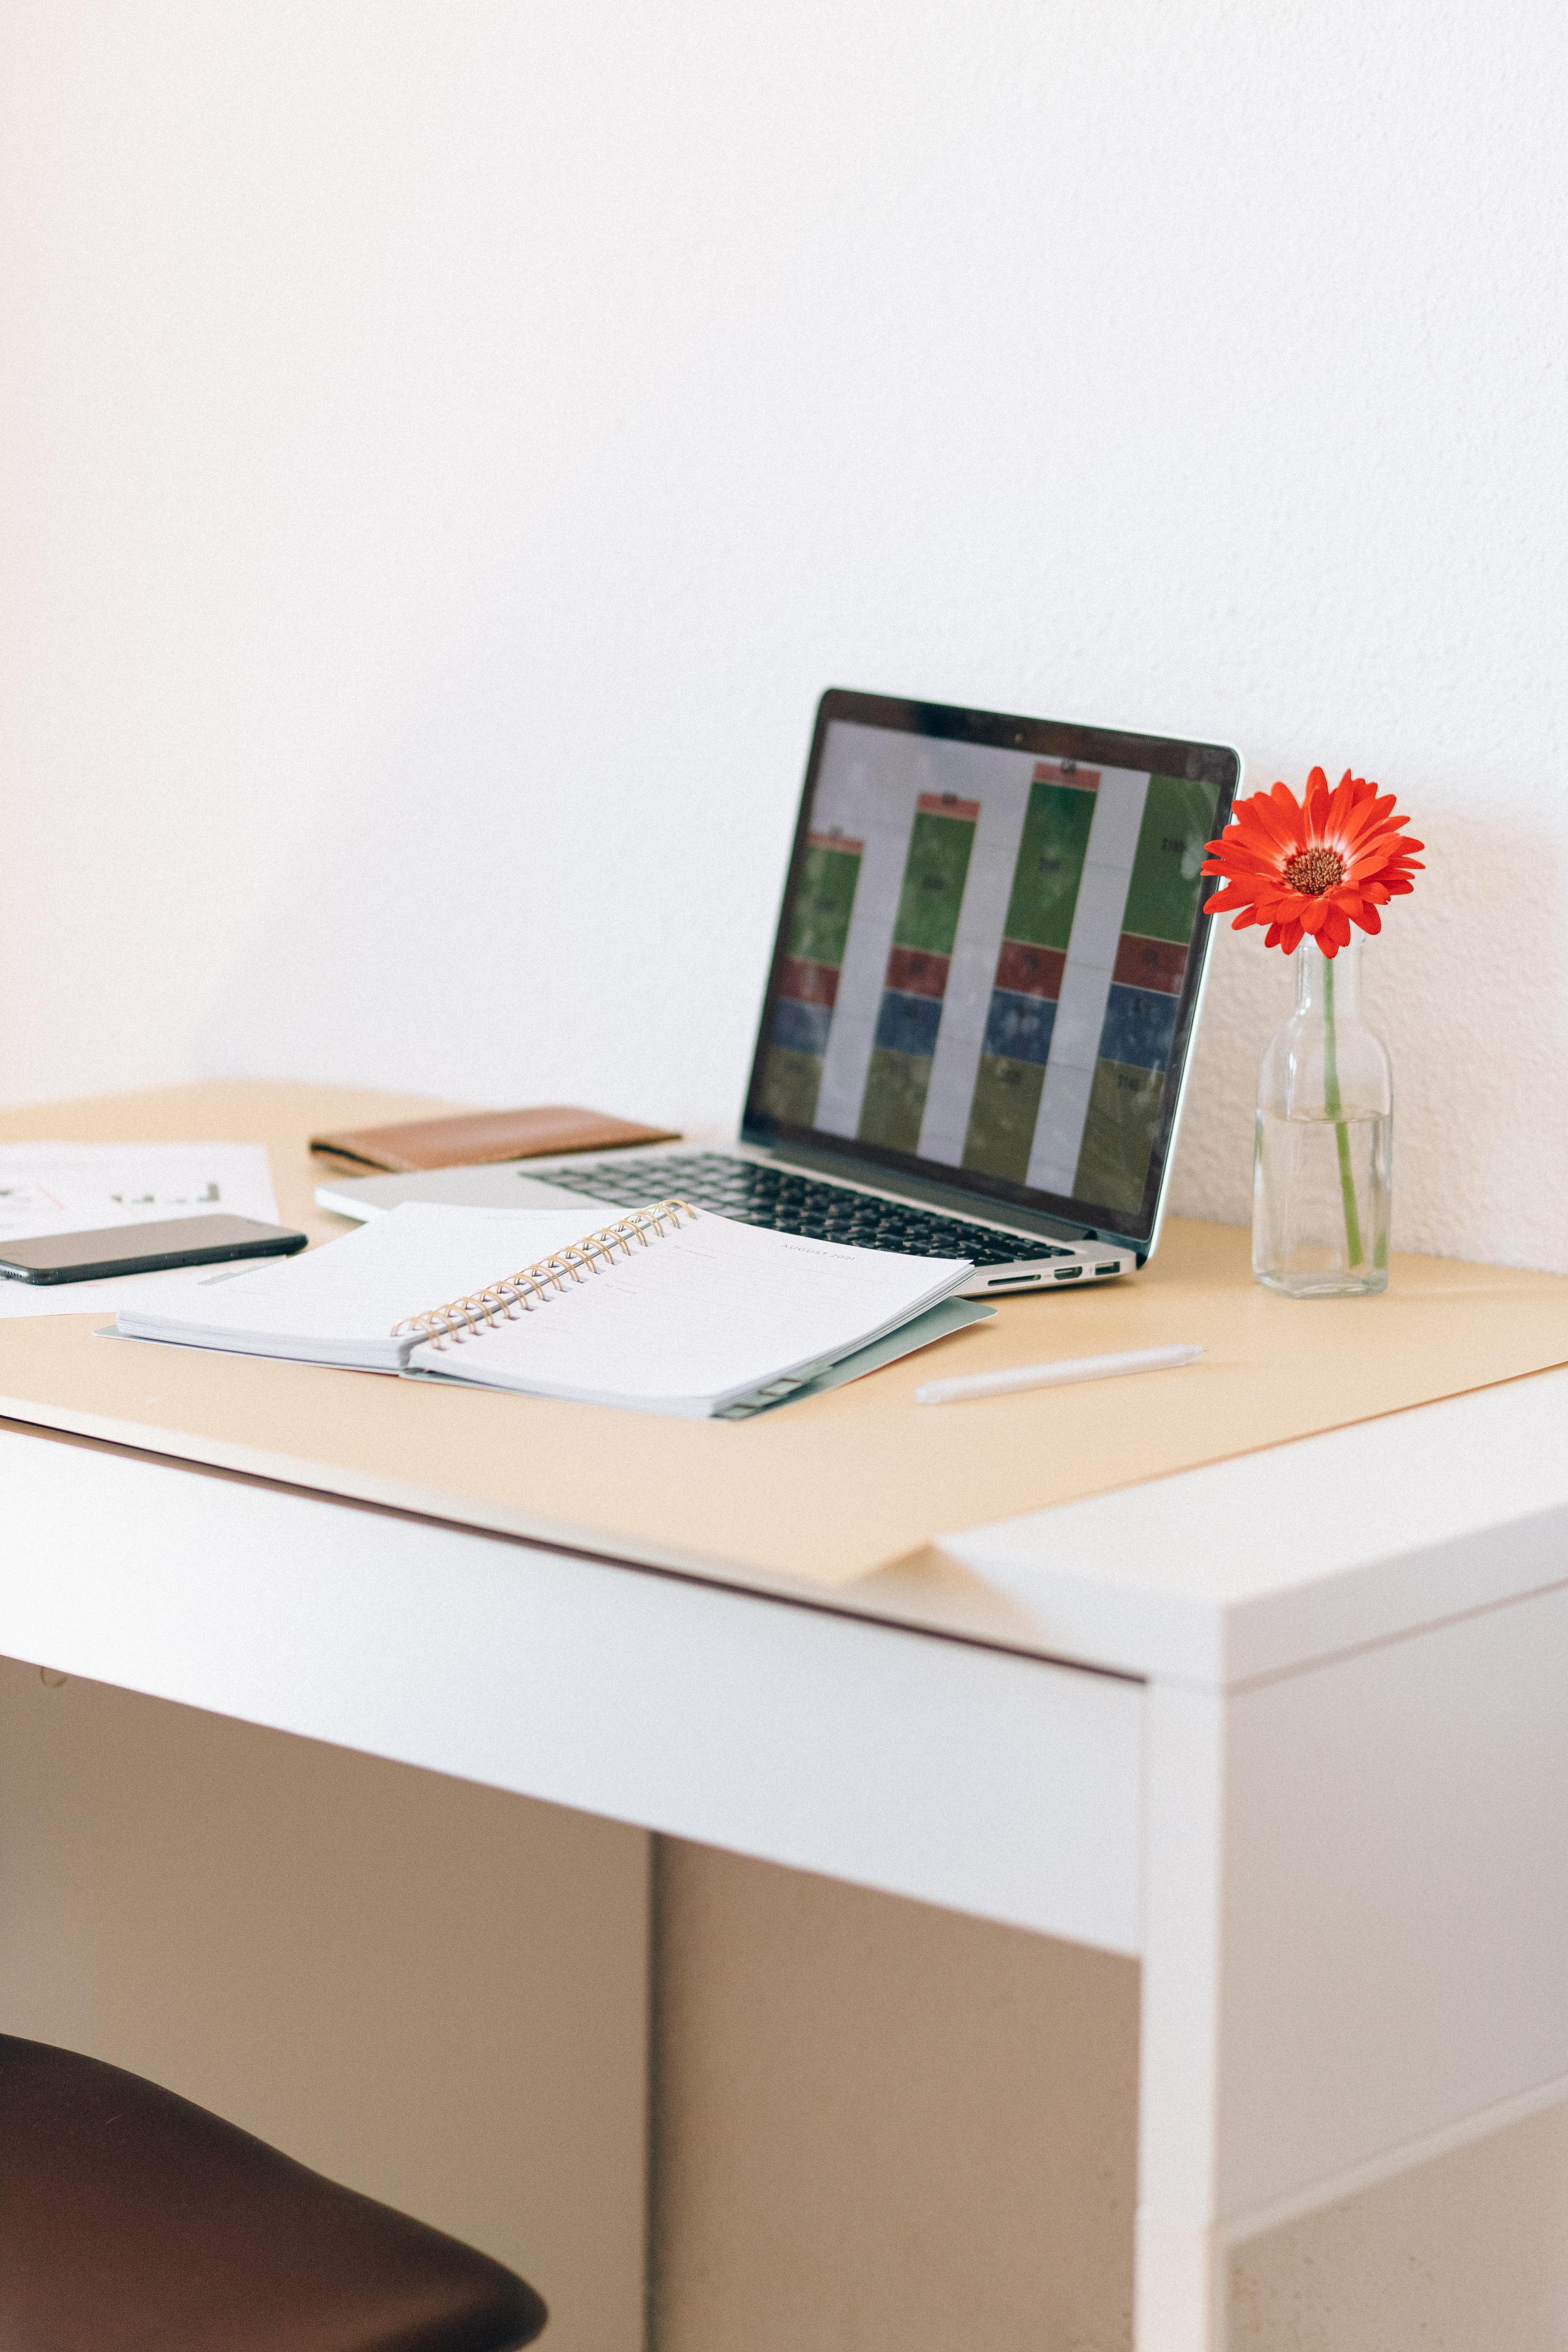 macbook pro on white wooden desk